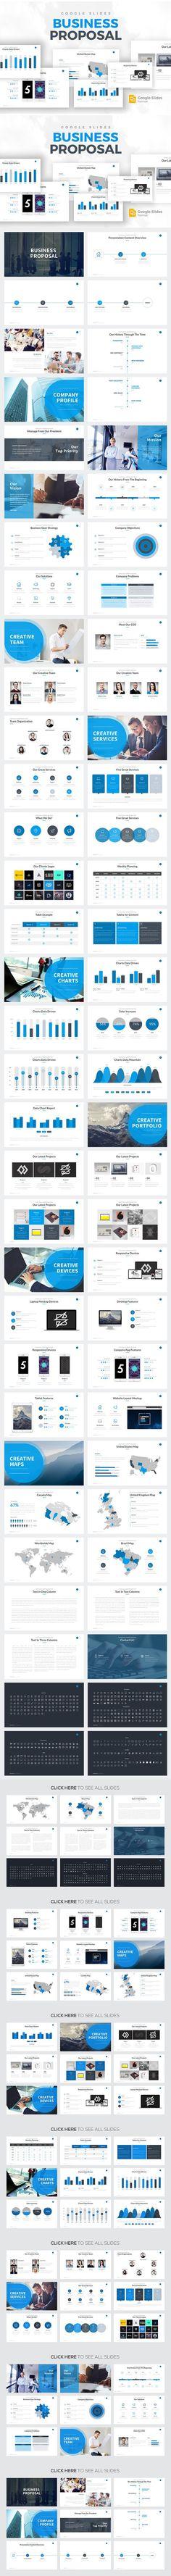 Business Proposal - Google Slides. Business Infographic